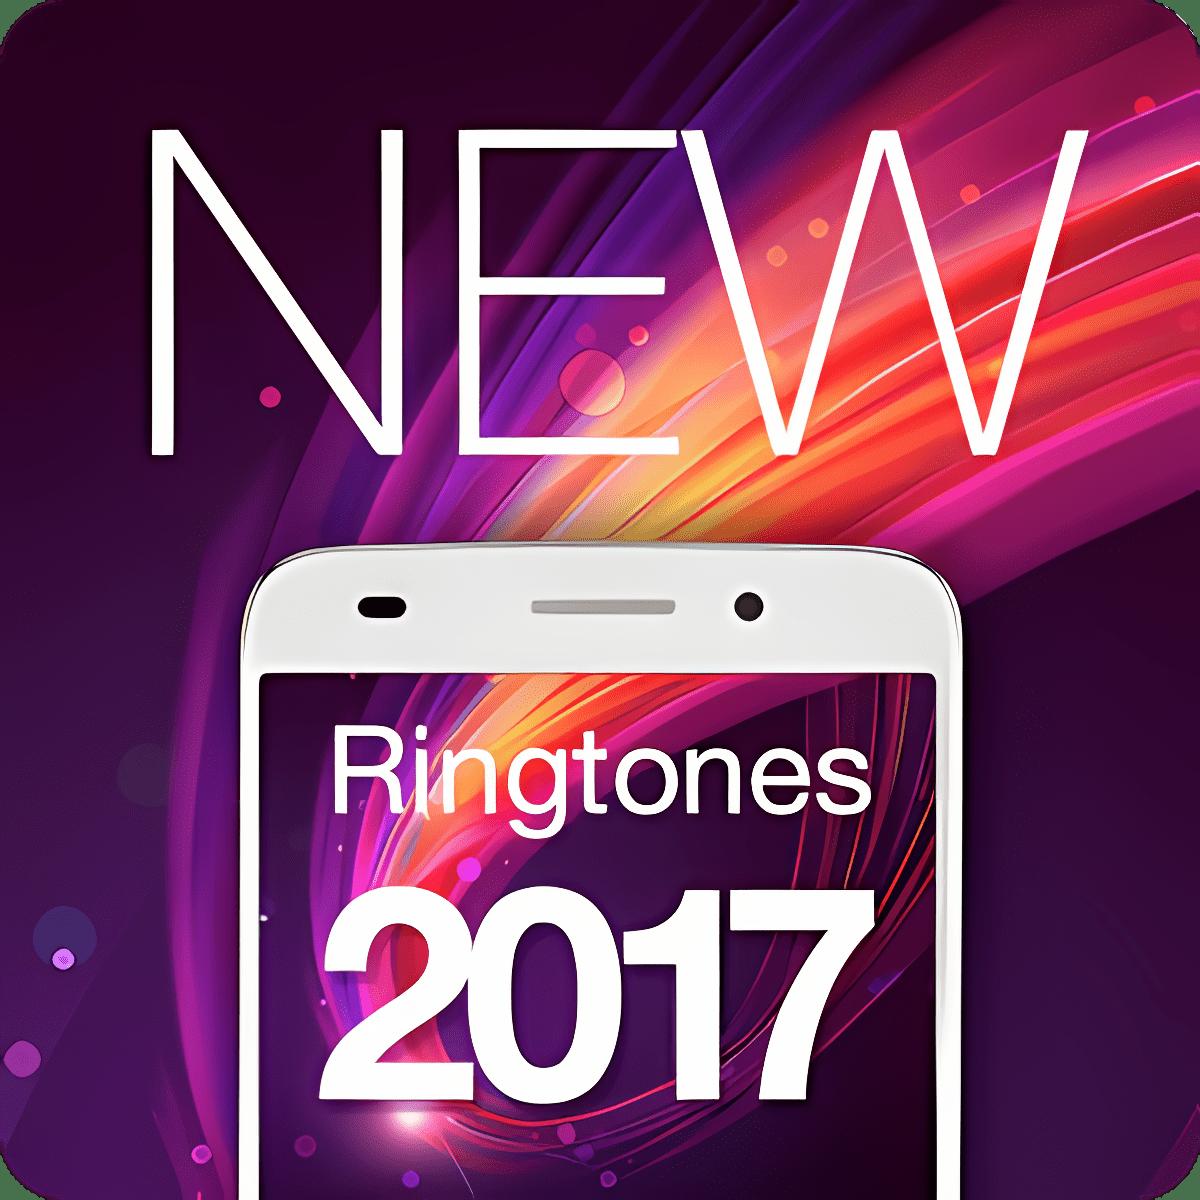 New Ringtones 2017 1.4